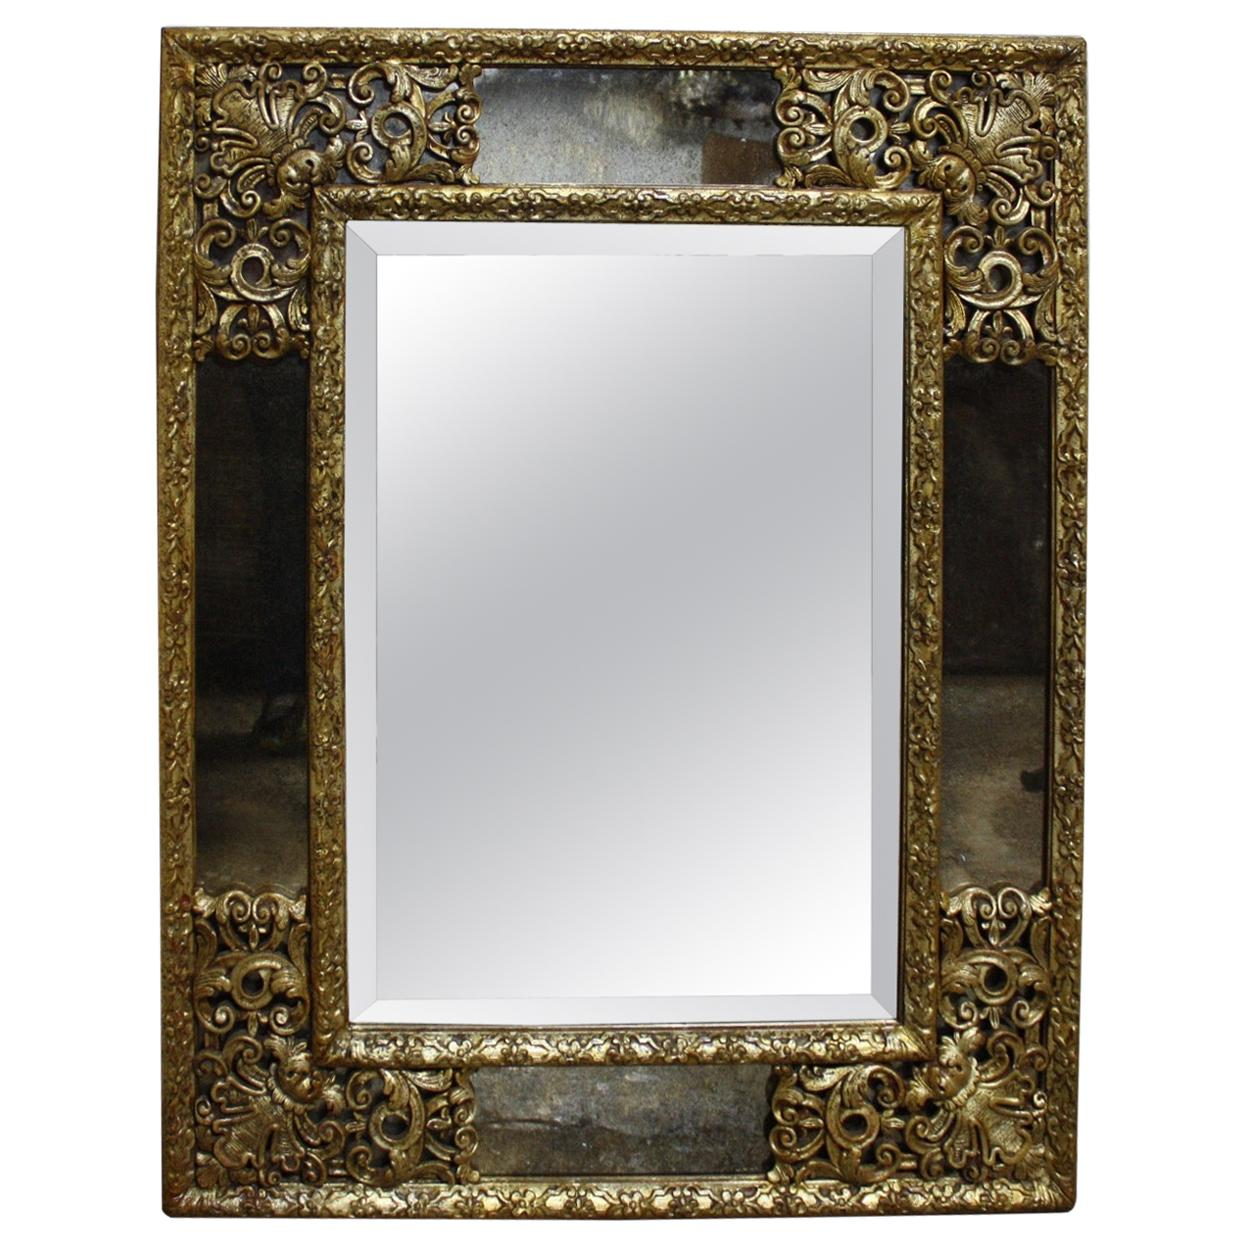 French Mirror, Louis XIV Style